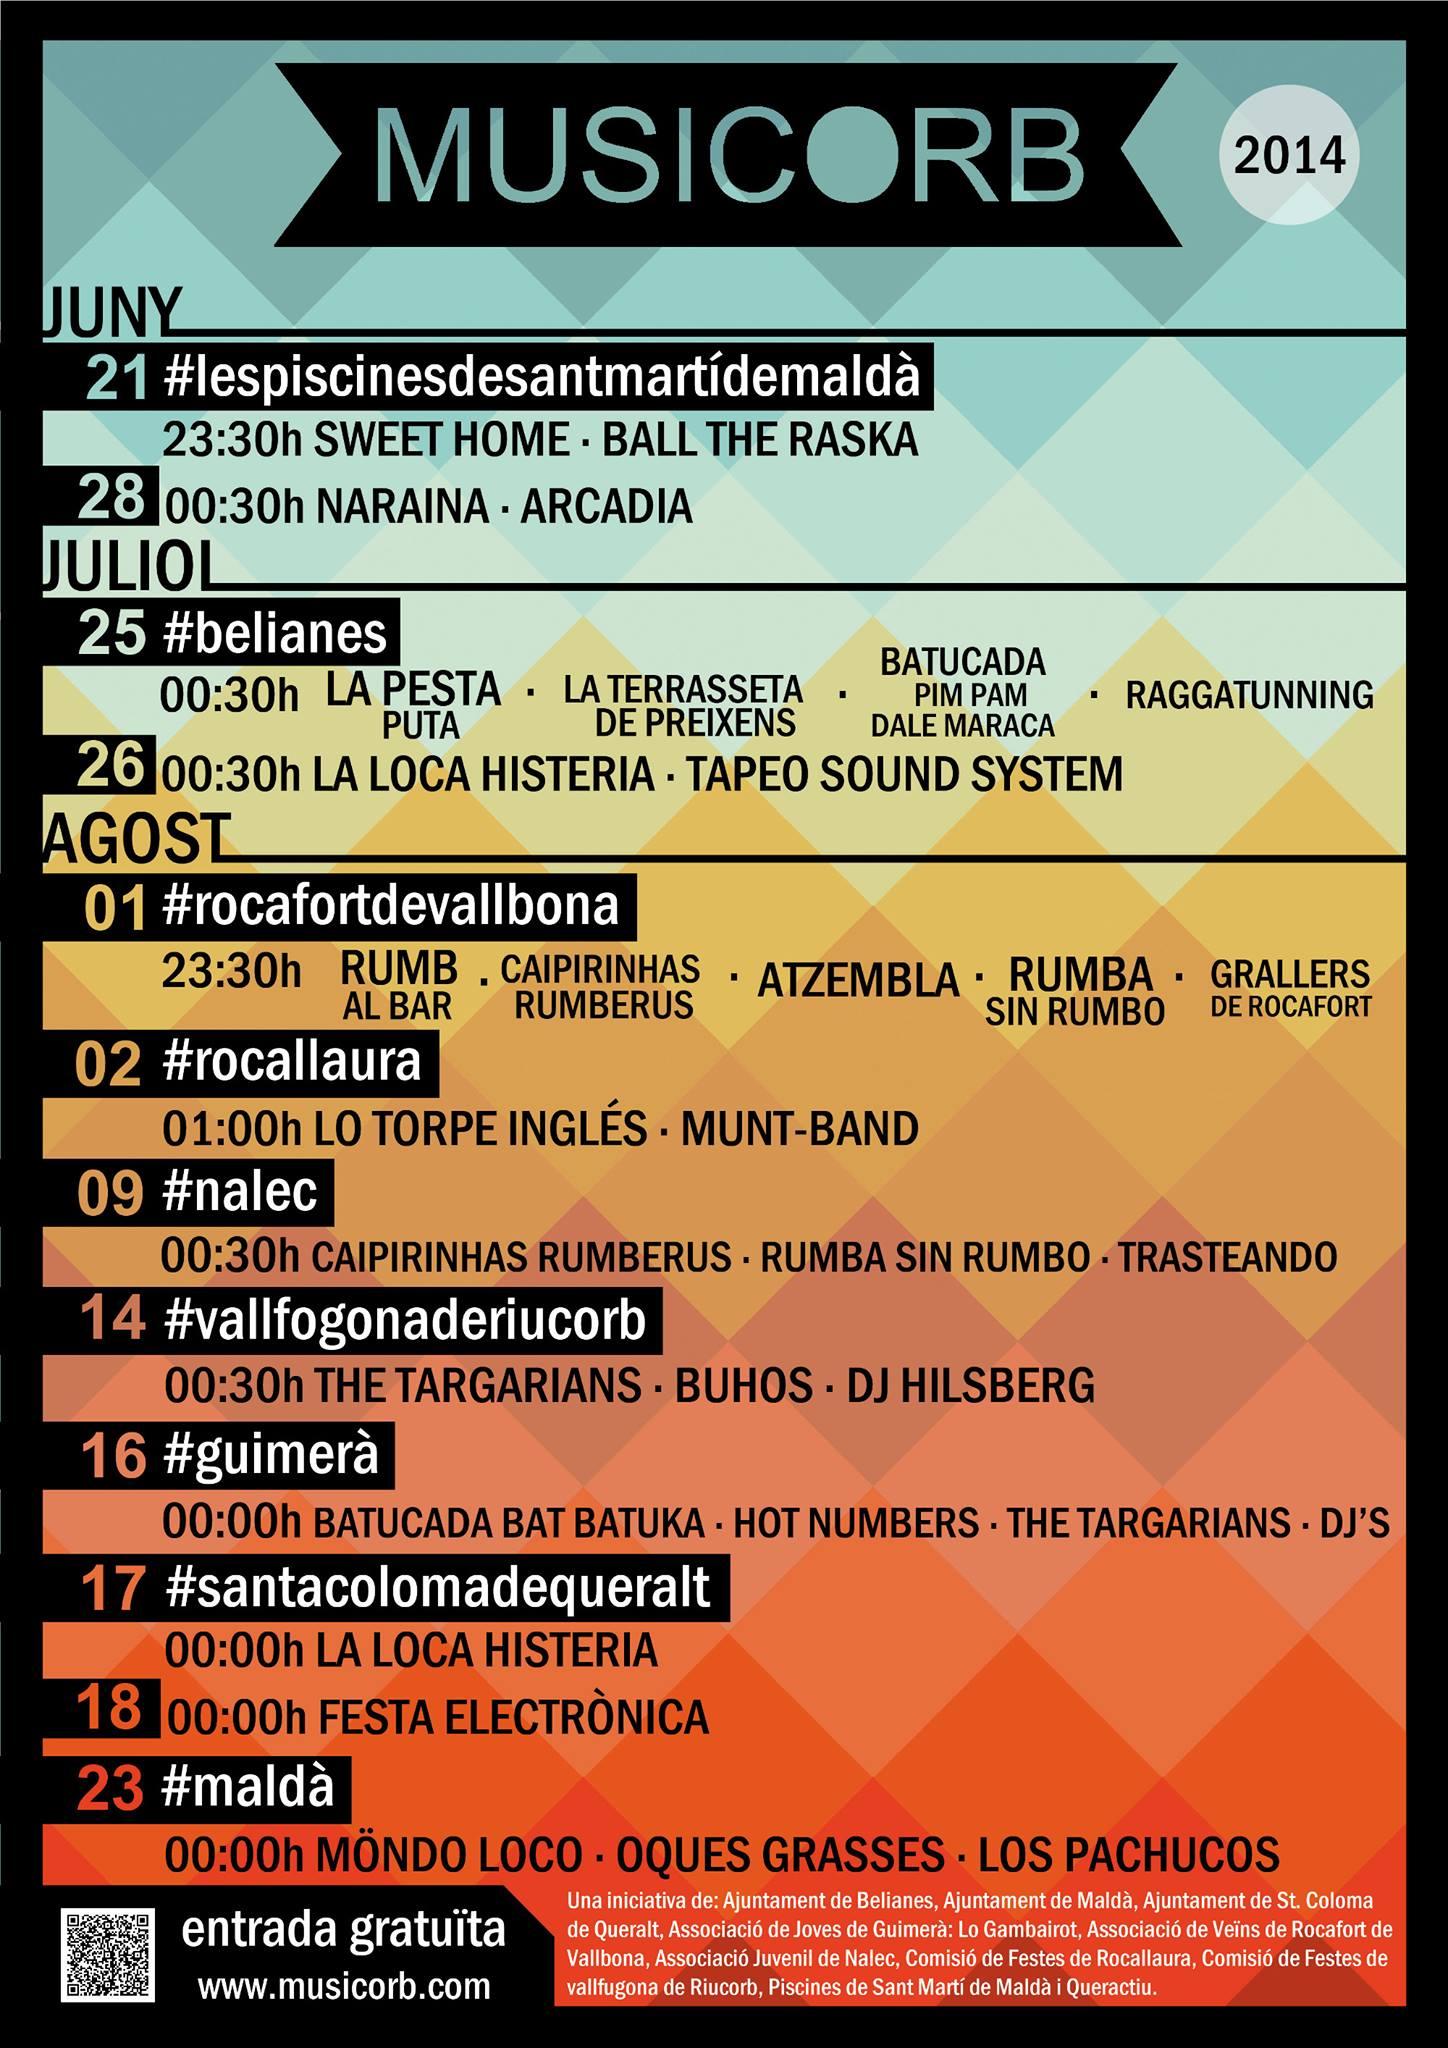 cartell Musicorb 2014